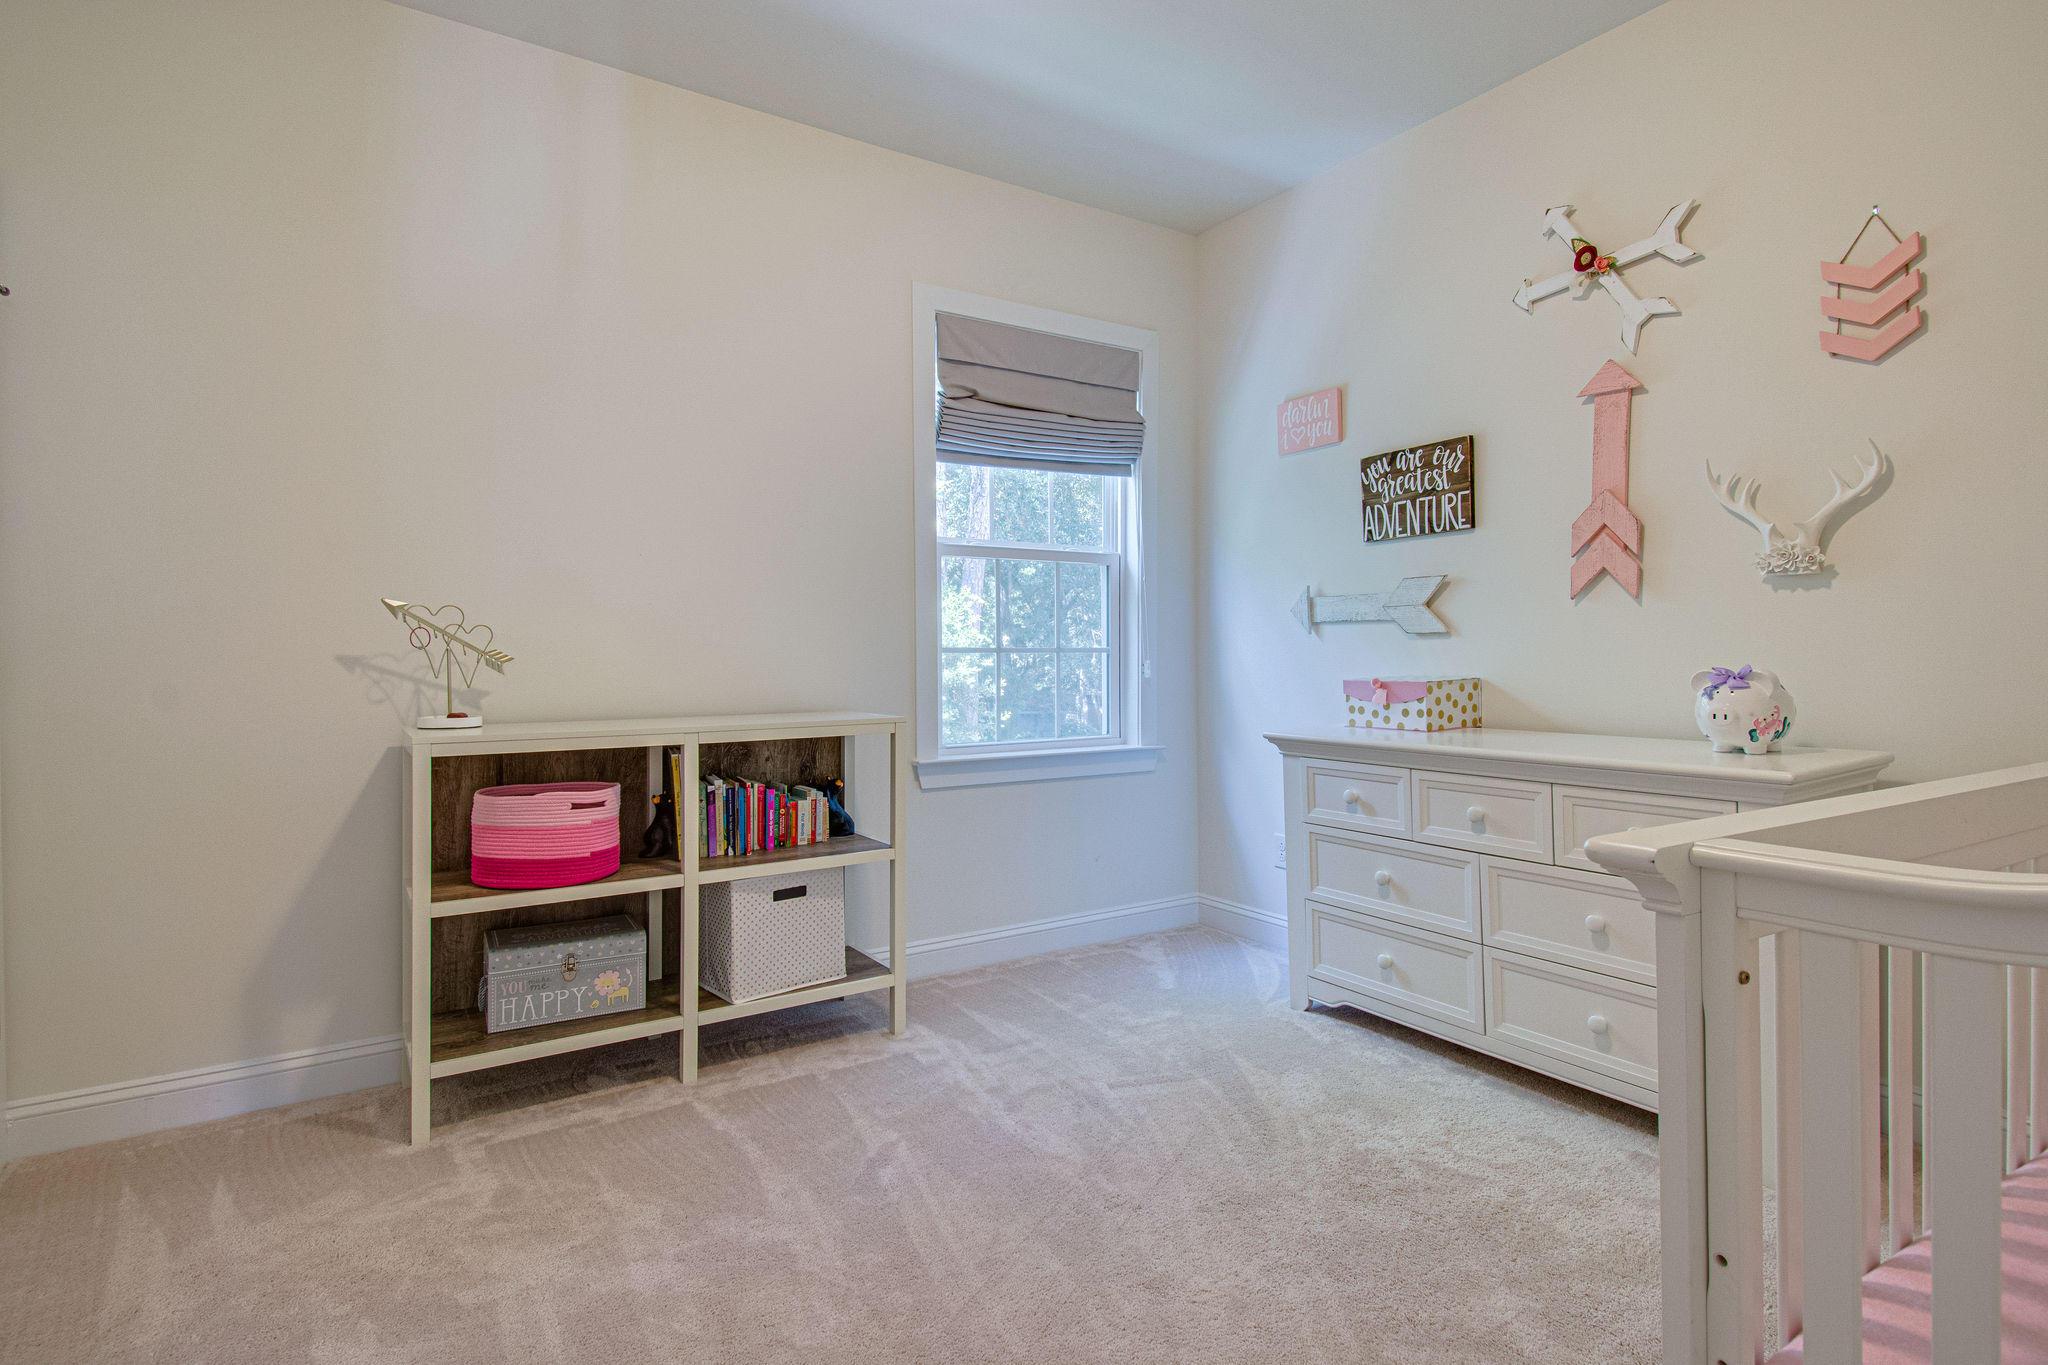 Magnolia Village Homes For Sale - 1261 Pearwood, Mount Pleasant, SC - 21